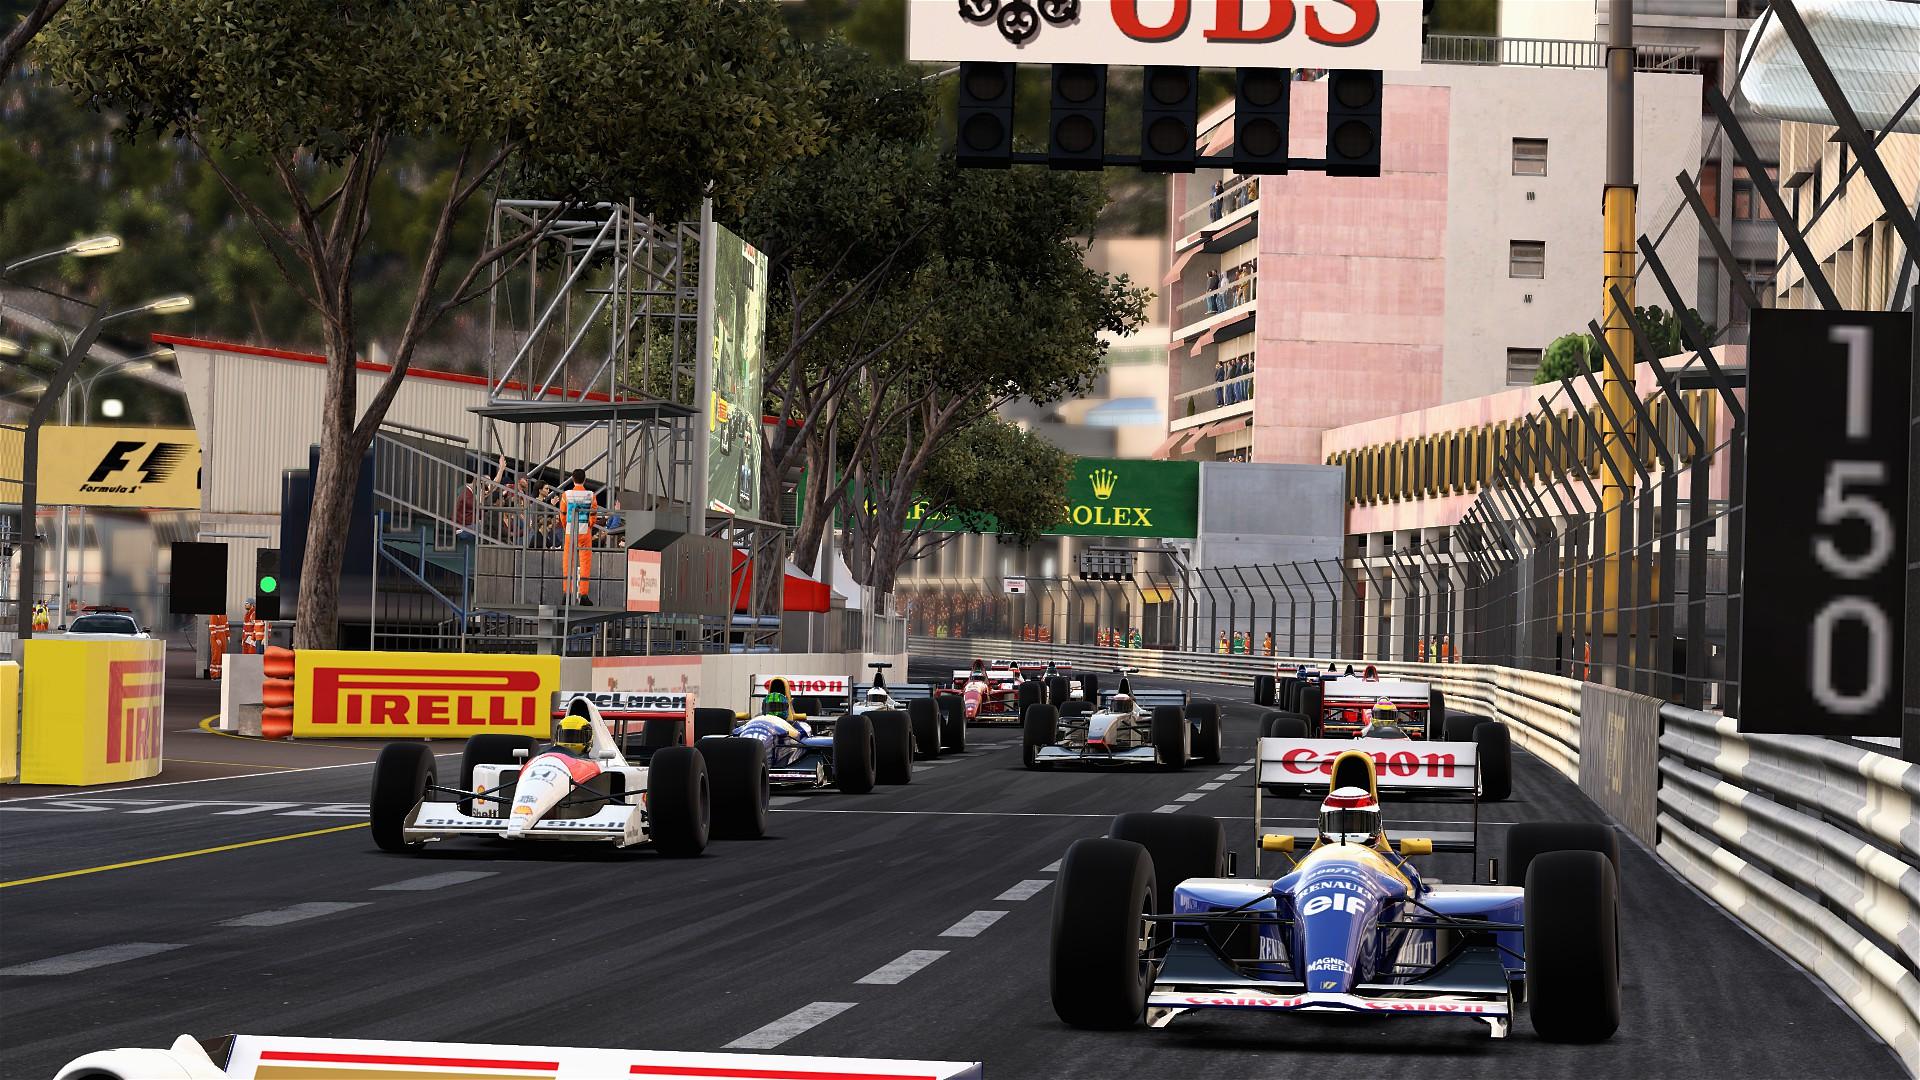 F1 2017 Review 2.jpg